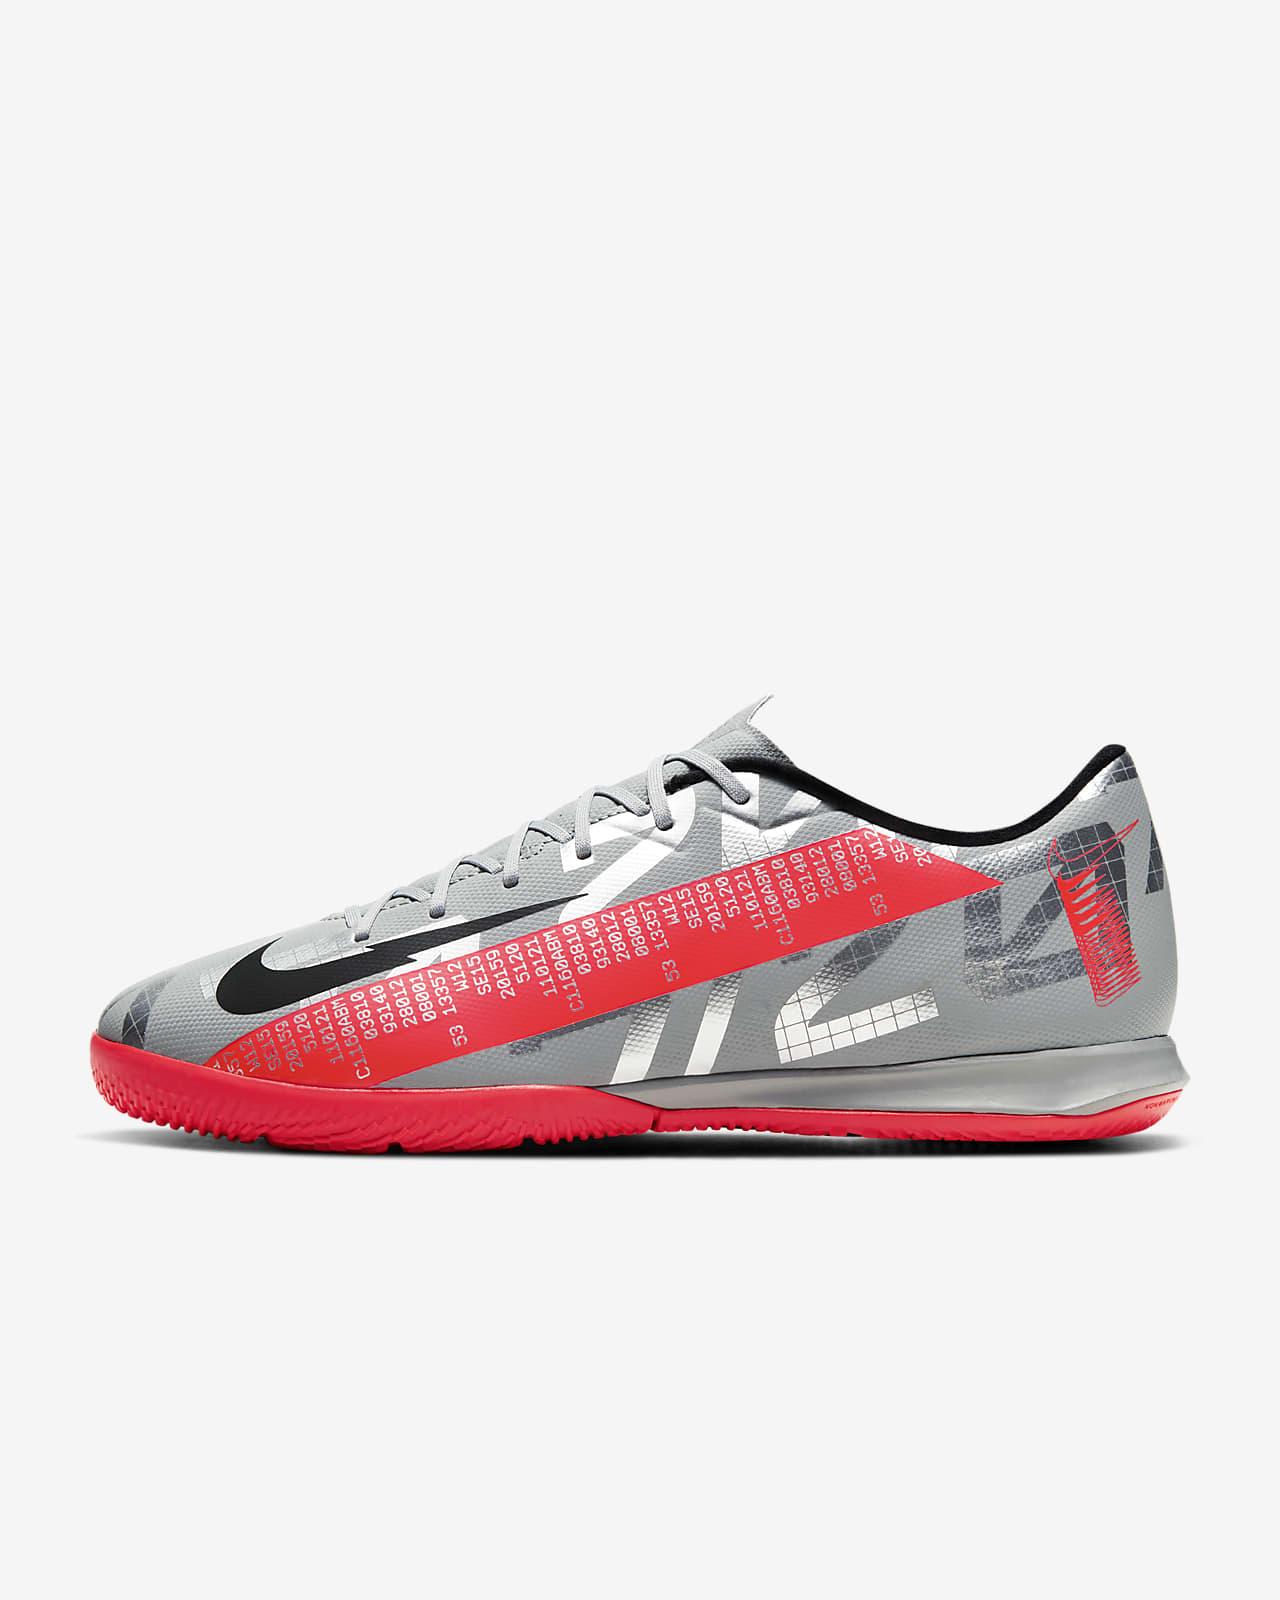 Chaussure de football en salle Nike Mercurial Vapor 13 Academy IC